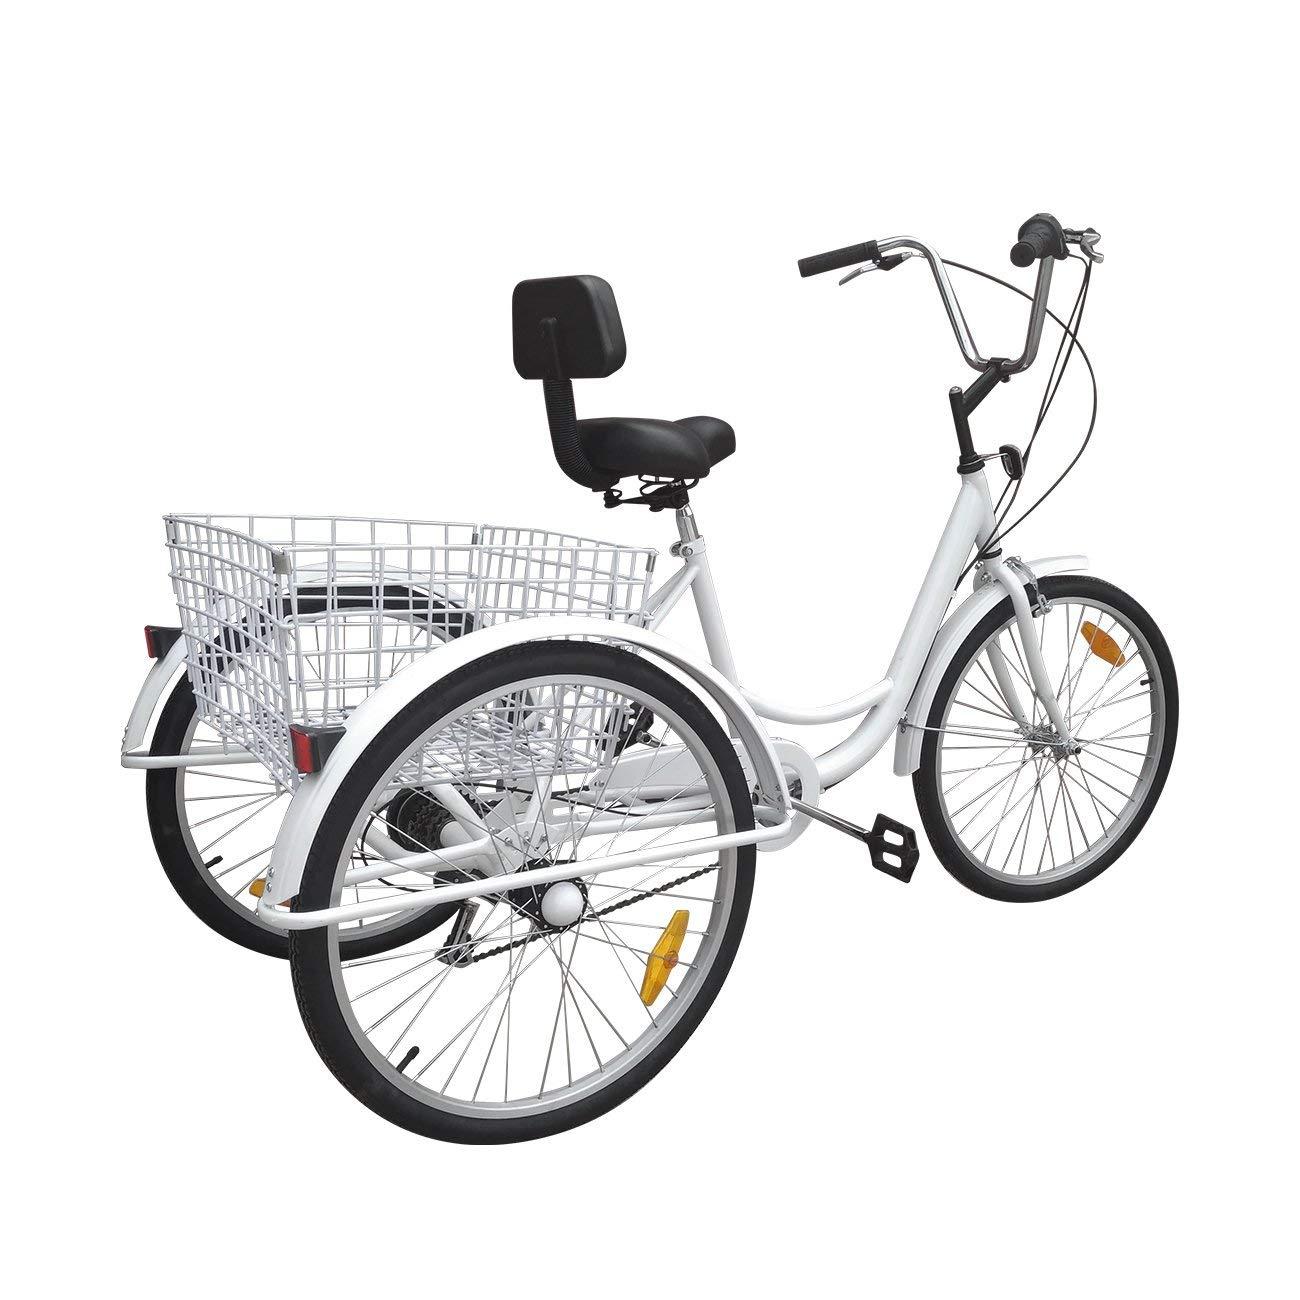 Bici a 3 ruote Urban Paneltech per adulti 6 velocitàe cestino00